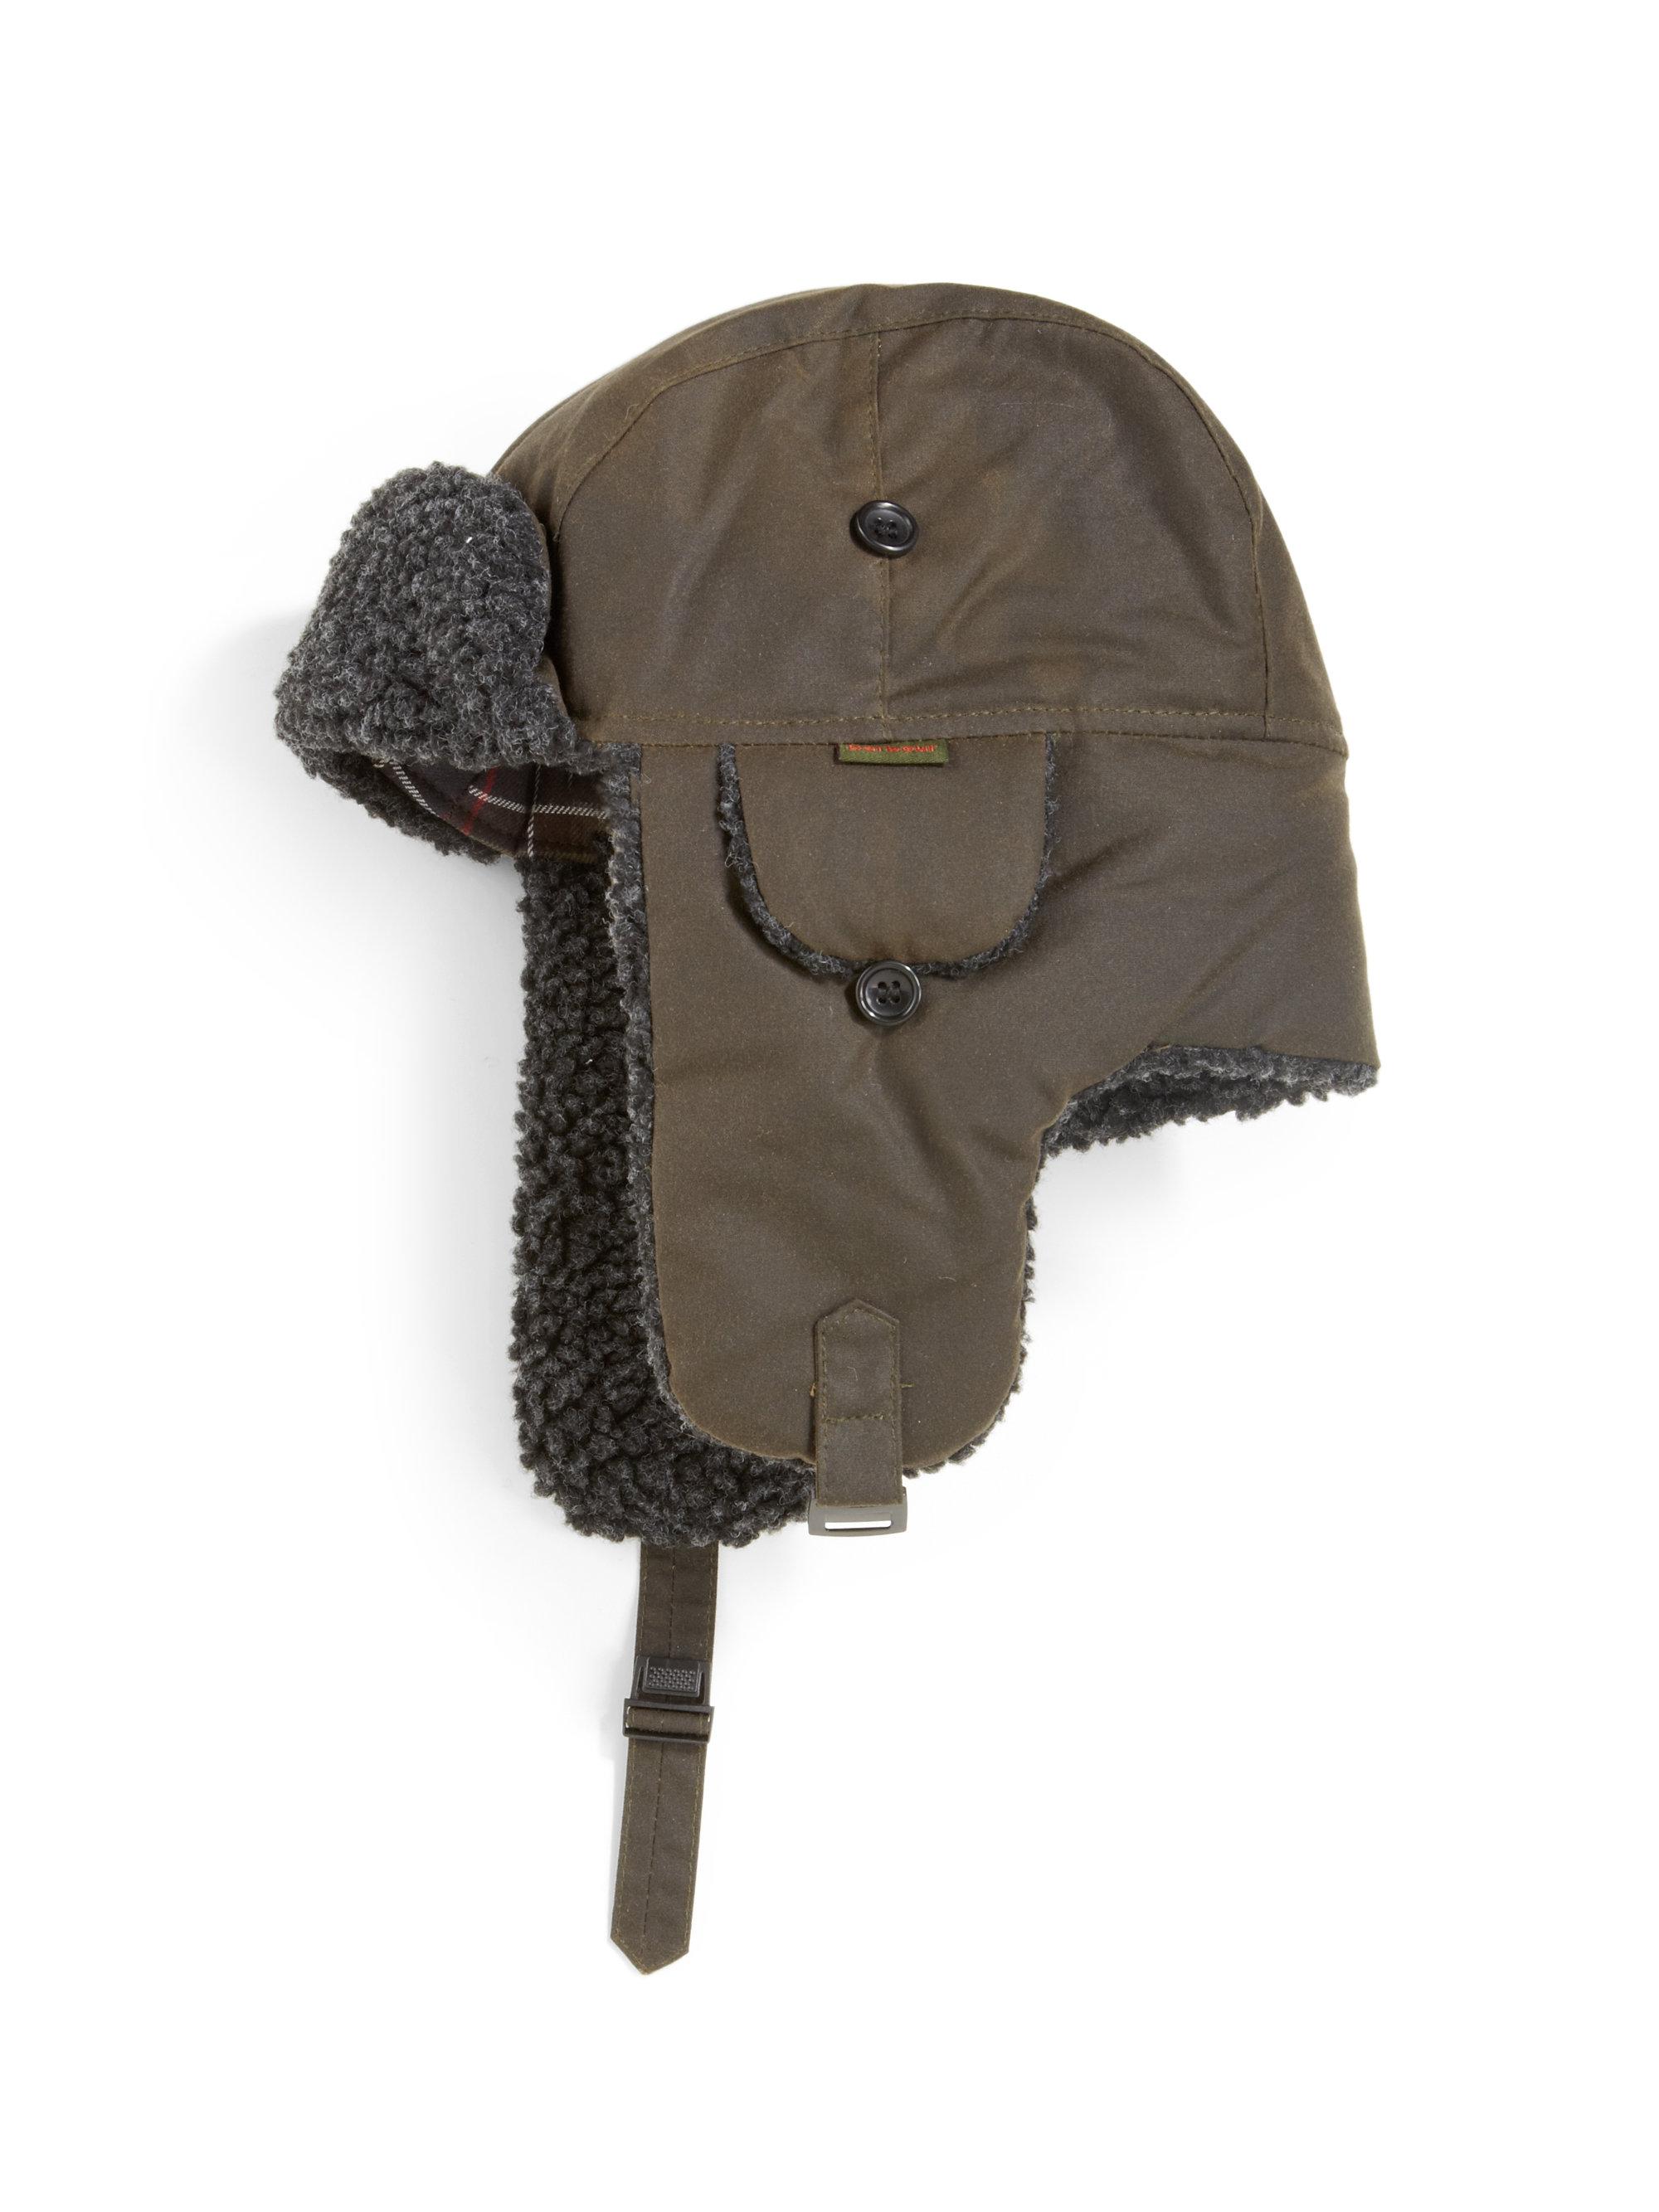 6c4bafce5e43 Barbour Fleecelined Cotton Trapper Hat in Brown for Men - Lyst